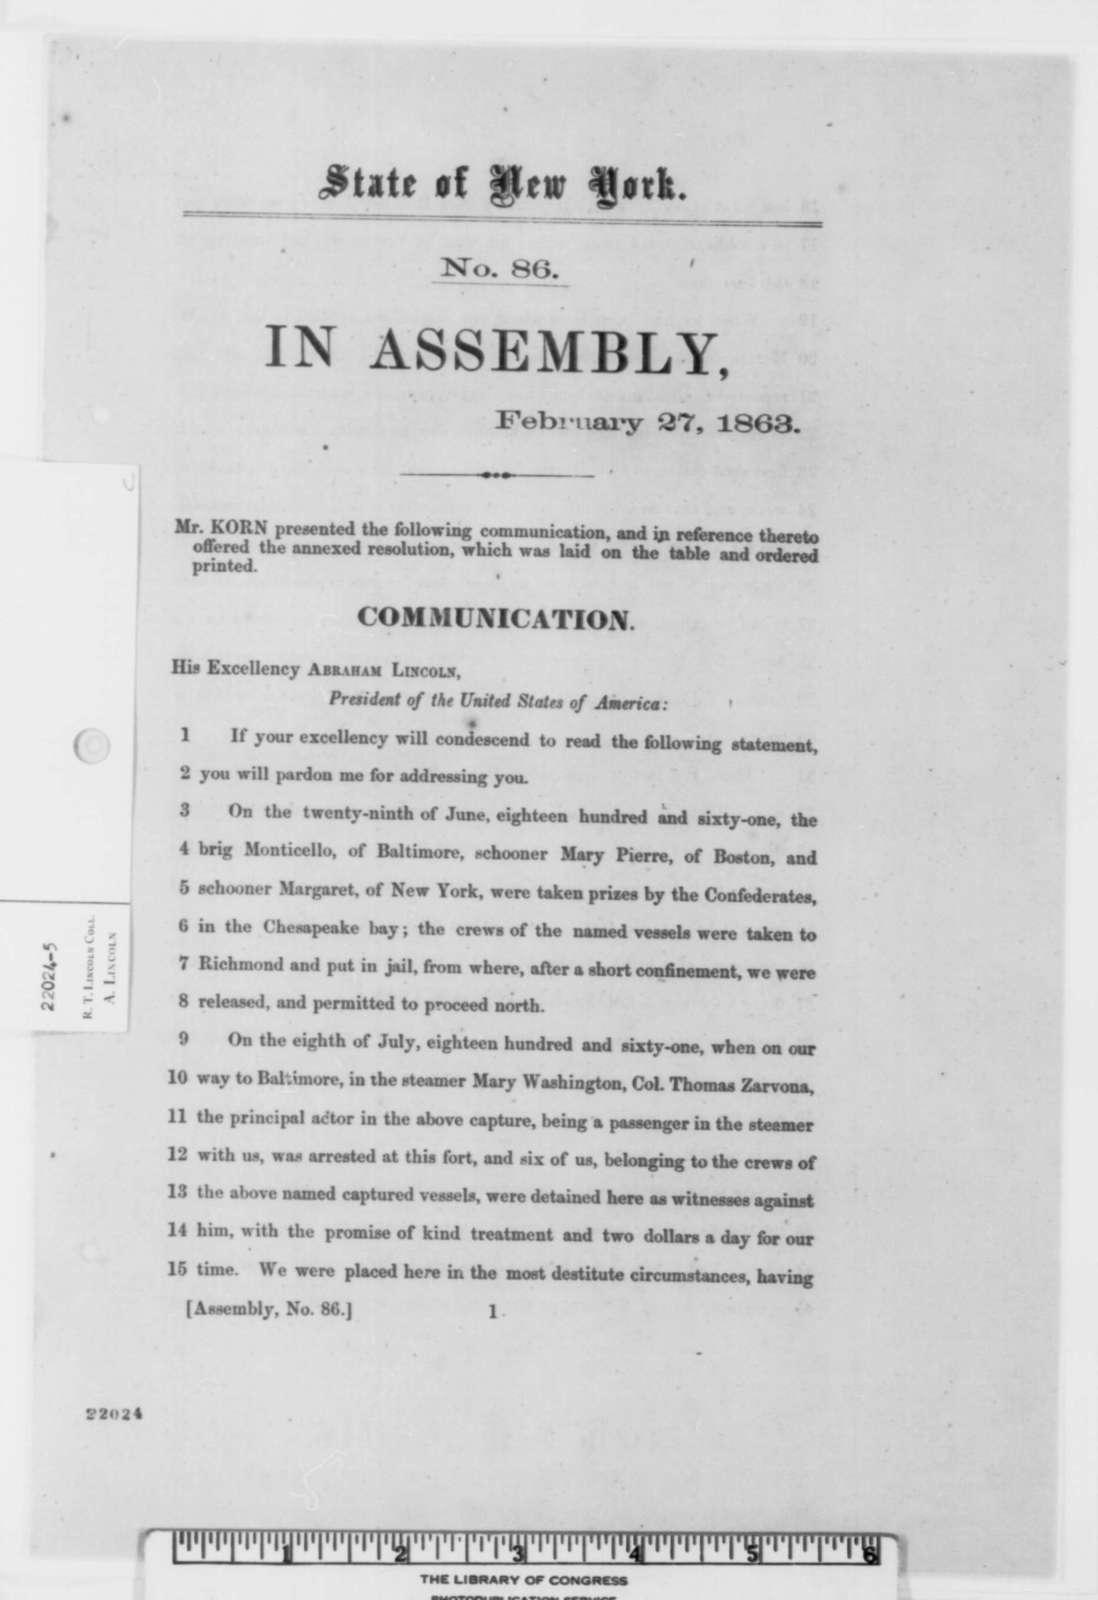 New York Legislature to Abraham Lincoln, Friday, February 27, 1863  (Printed Resolution)